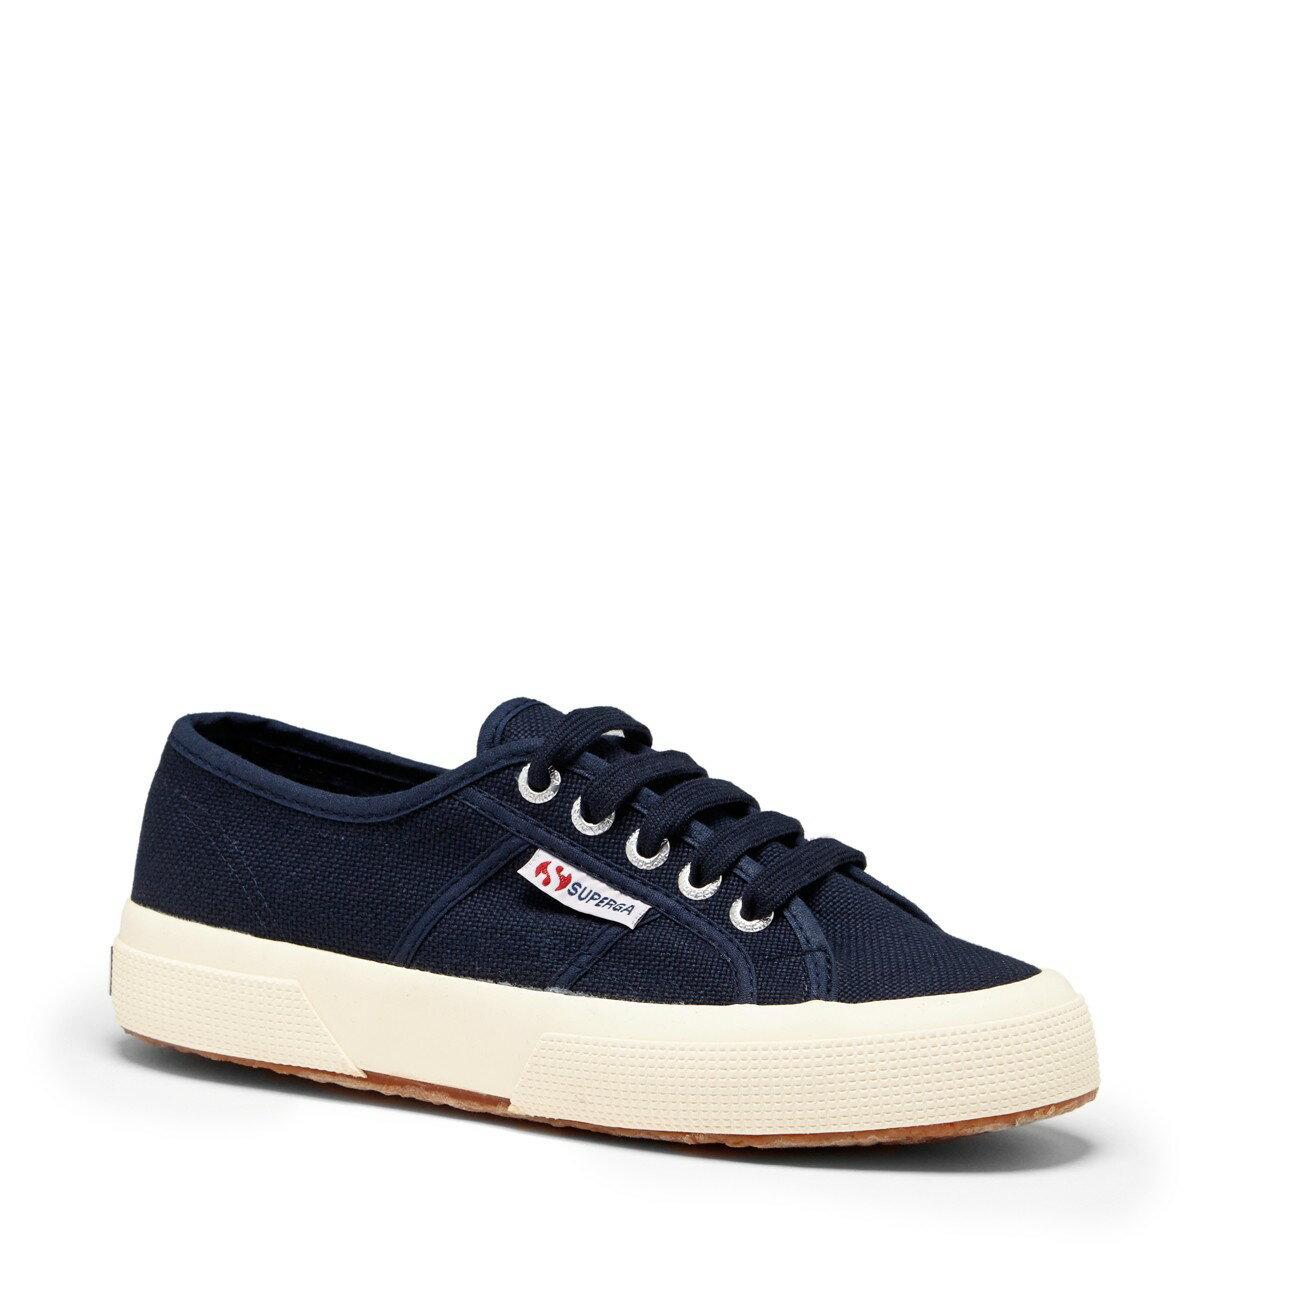 【SUPERGA】義大利國民鞋-深藍  Cotu - Classic2750 0